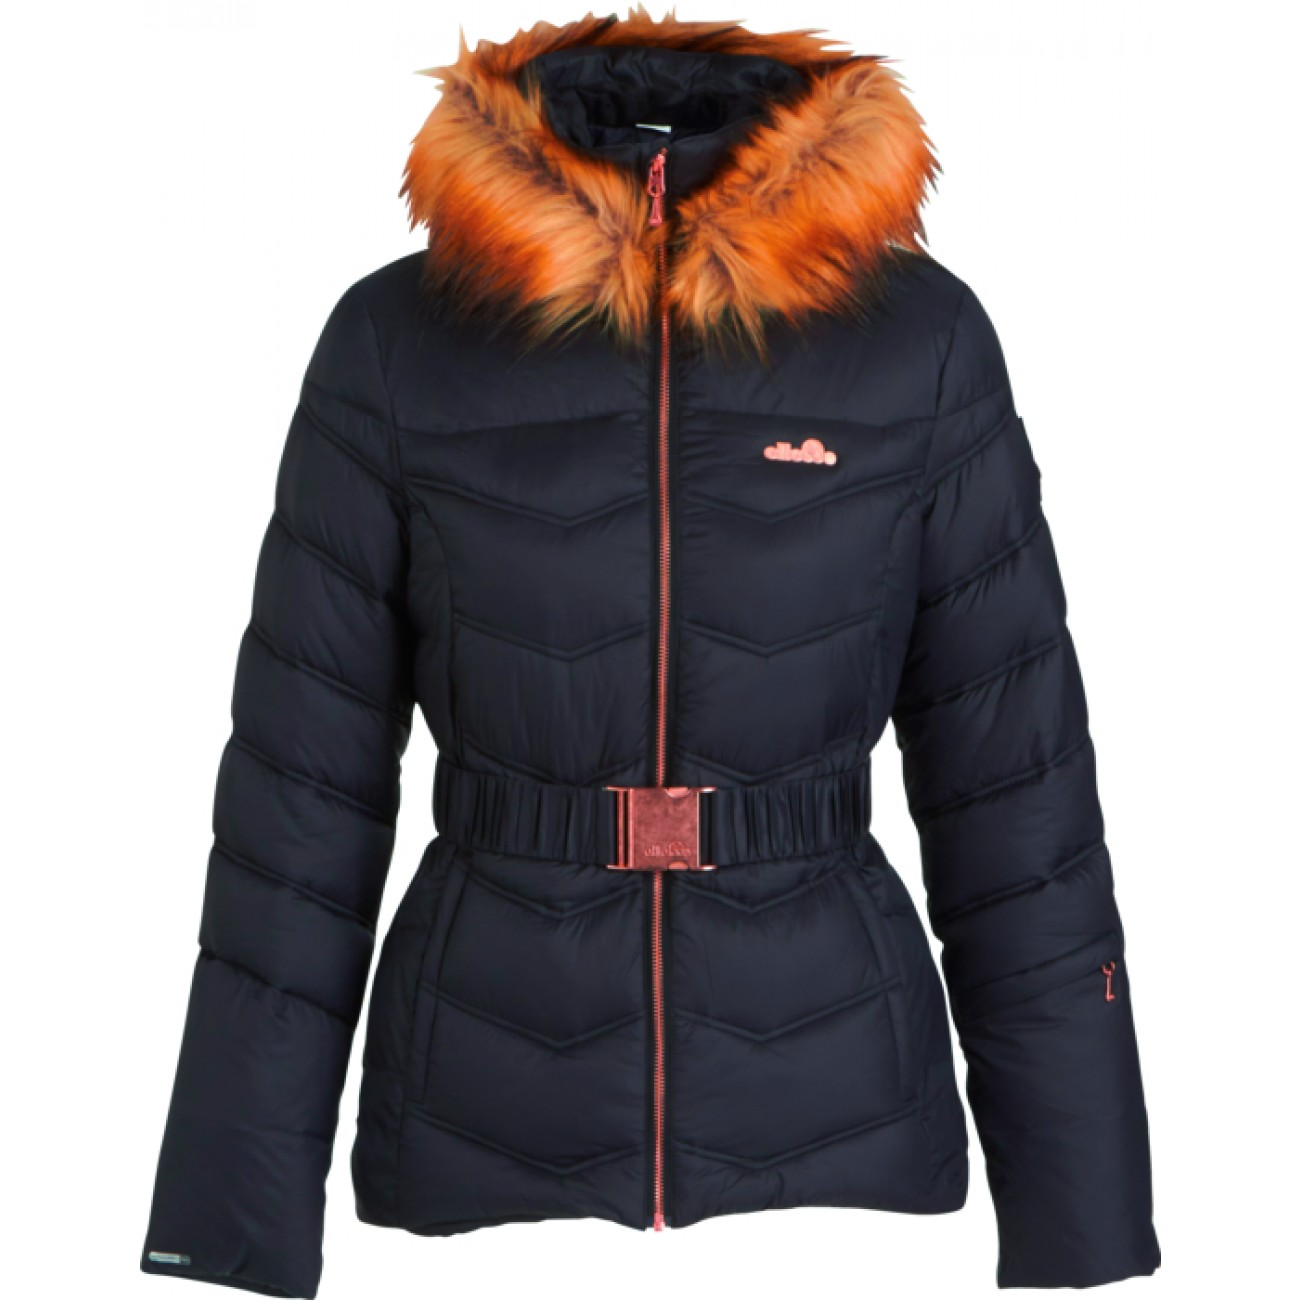 veste de ski femme grande taille pas cher vetement. Black Bedroom Furniture Sets. Home Design Ideas